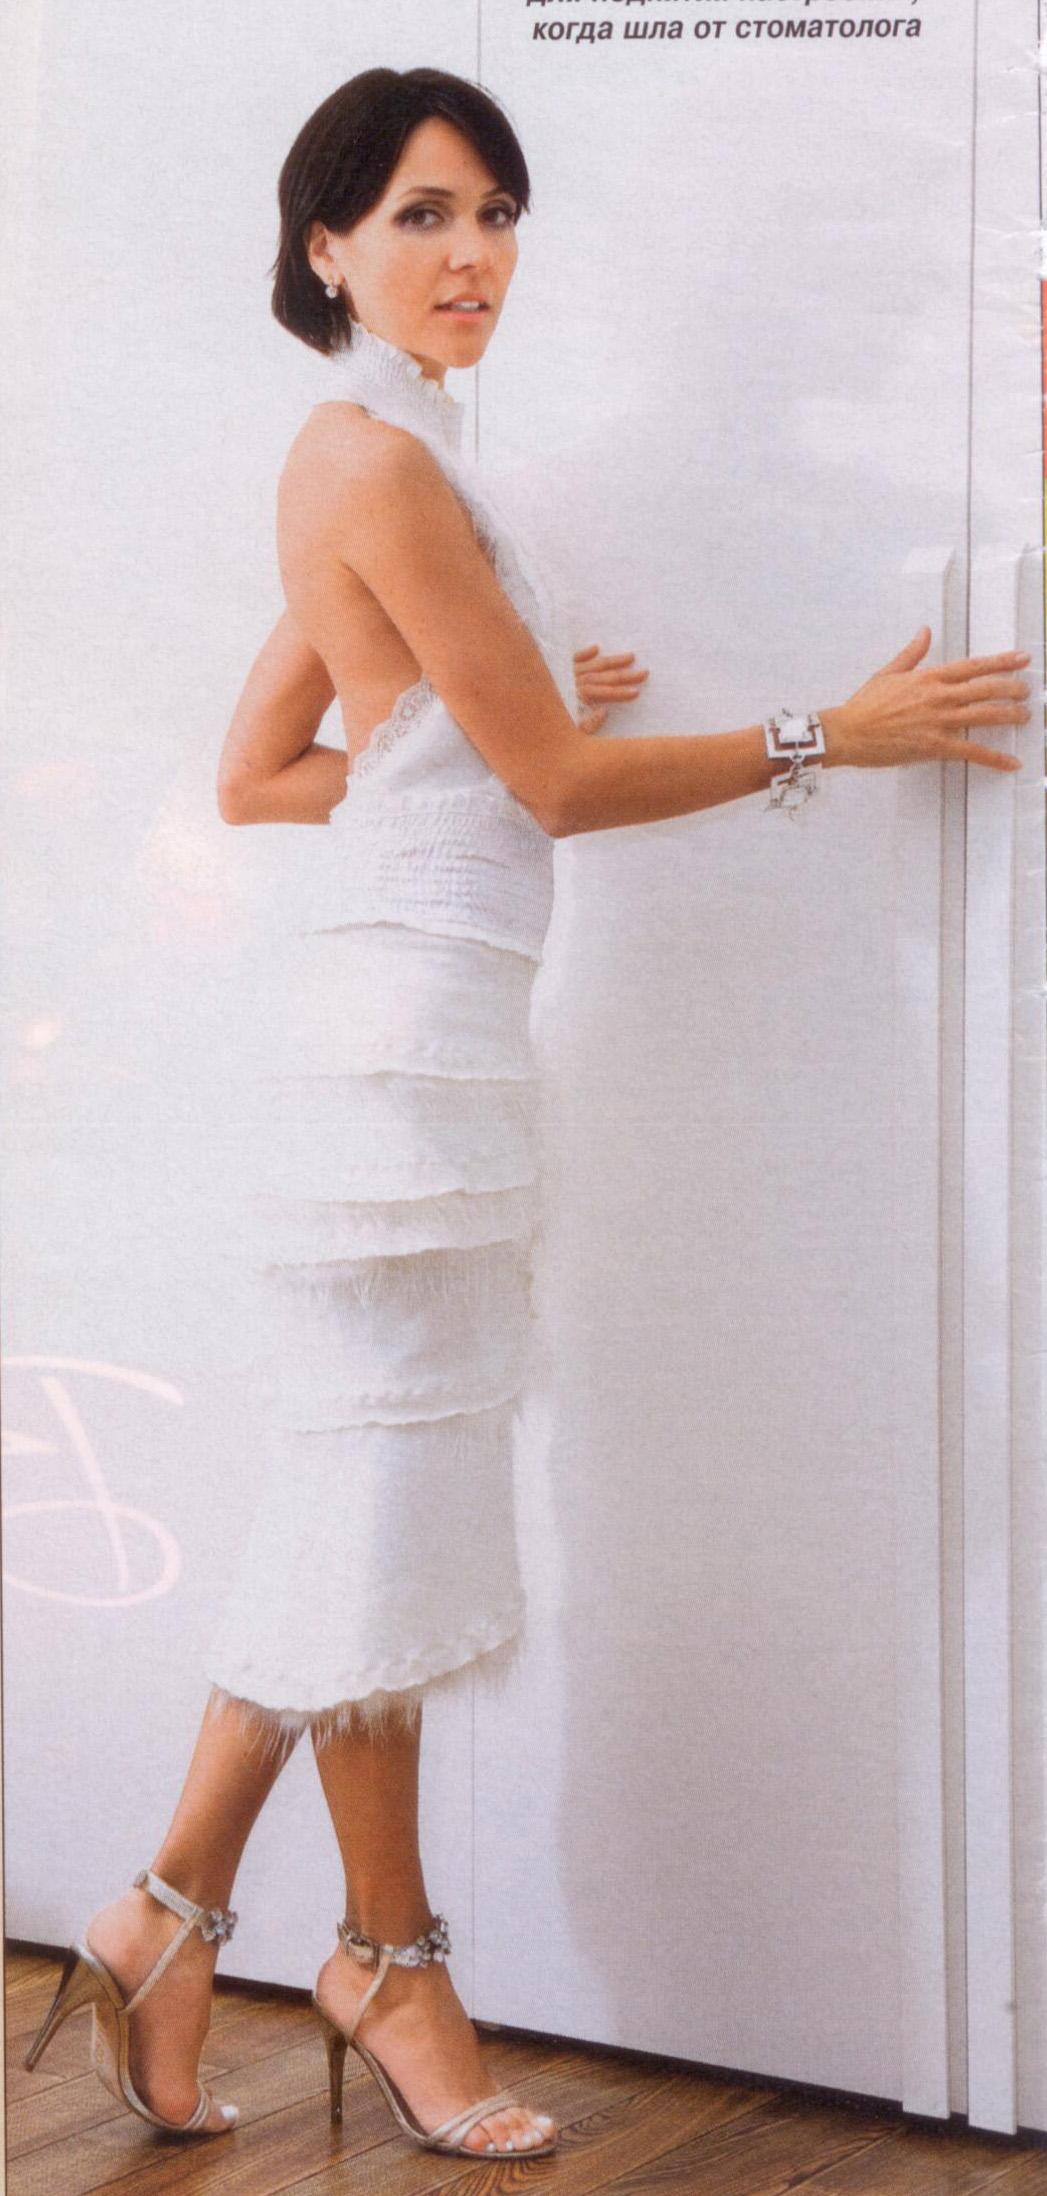 Анастасия чернобровина вышла замуж фото